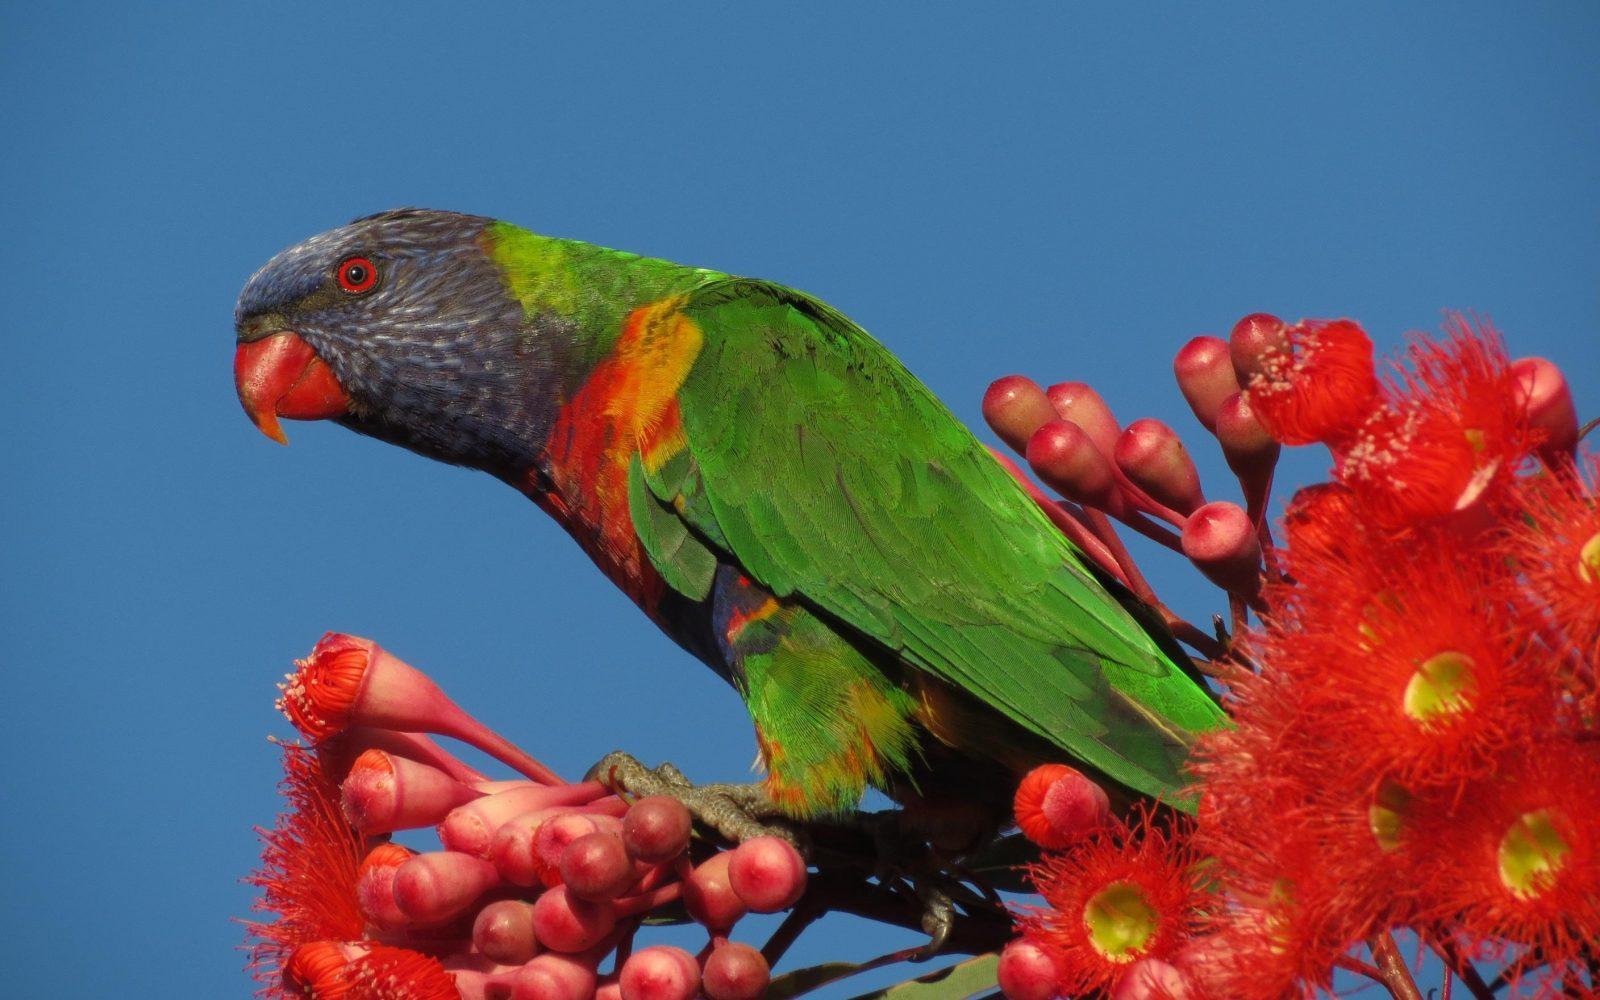 Rainbow Lorikeet by Ann Somerville-Charles